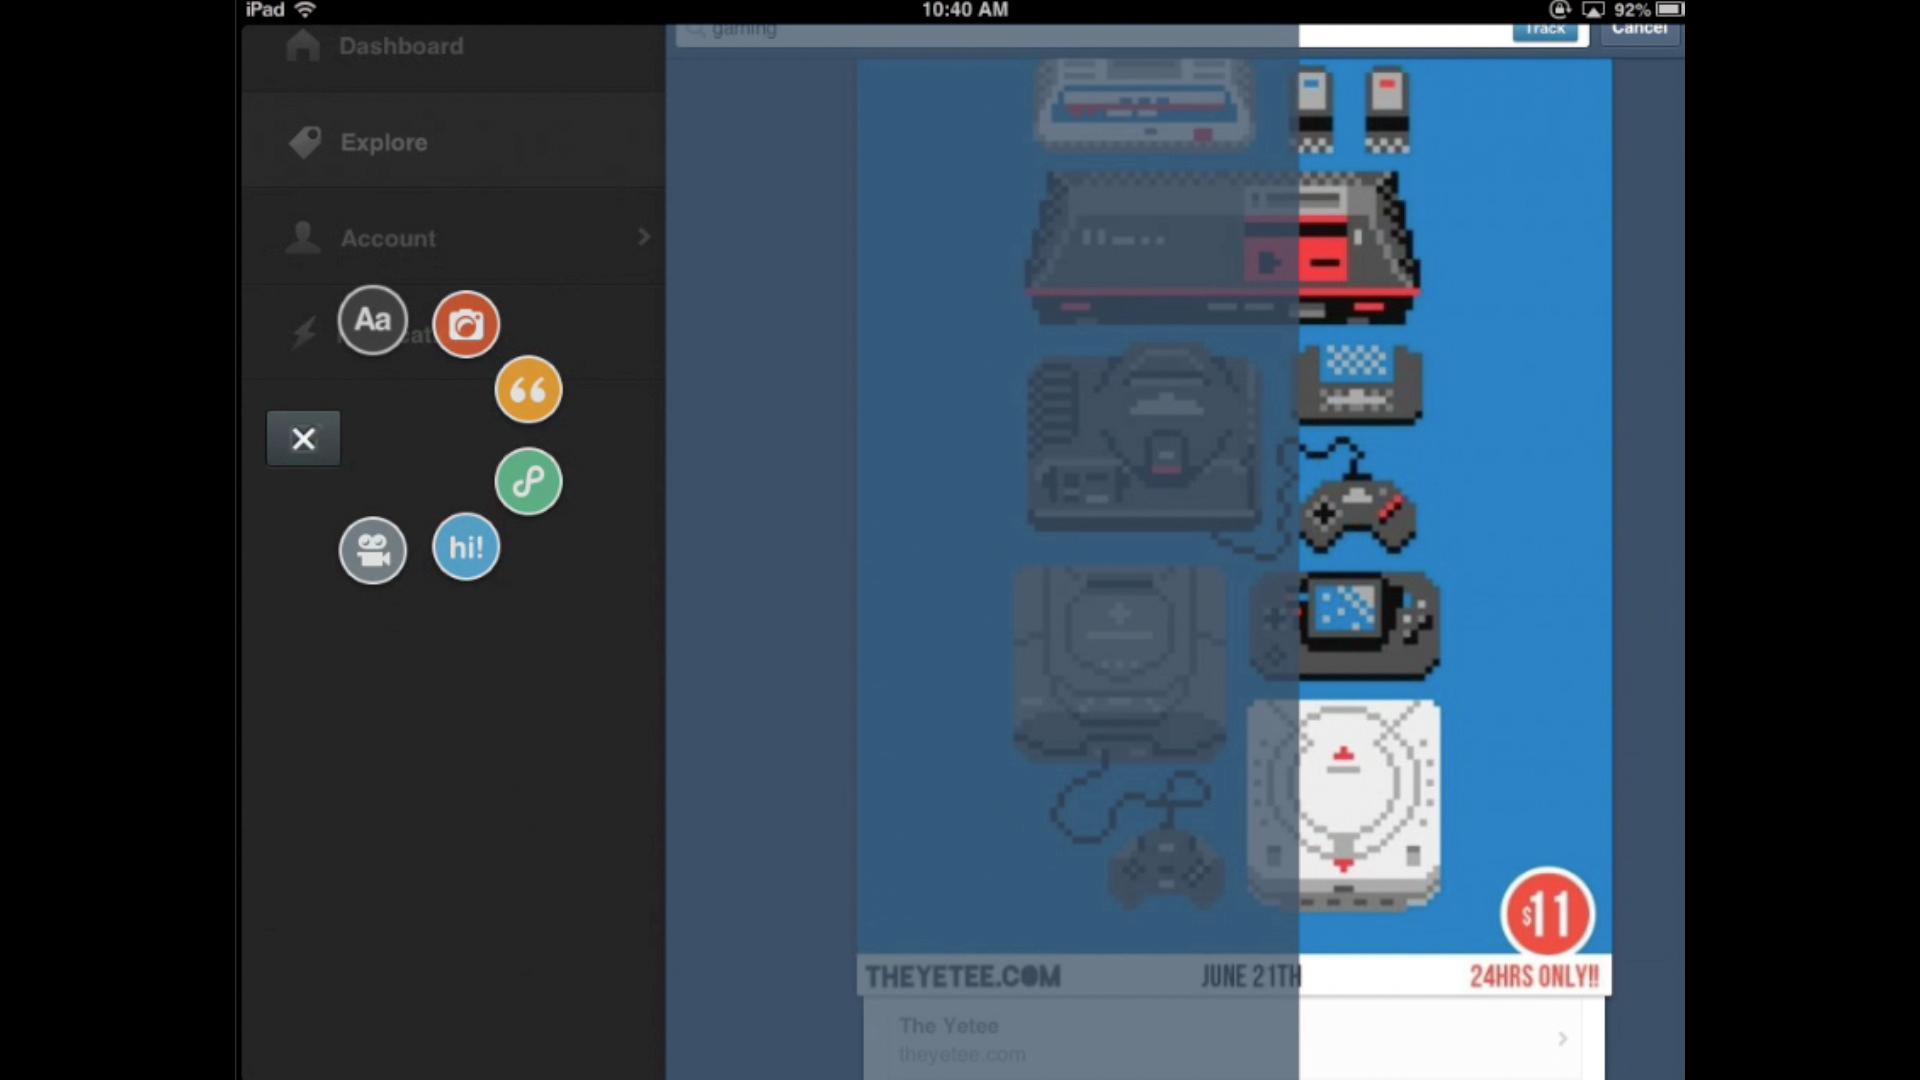 UX Spotlight: Behind the scenes of Tumblr's design process